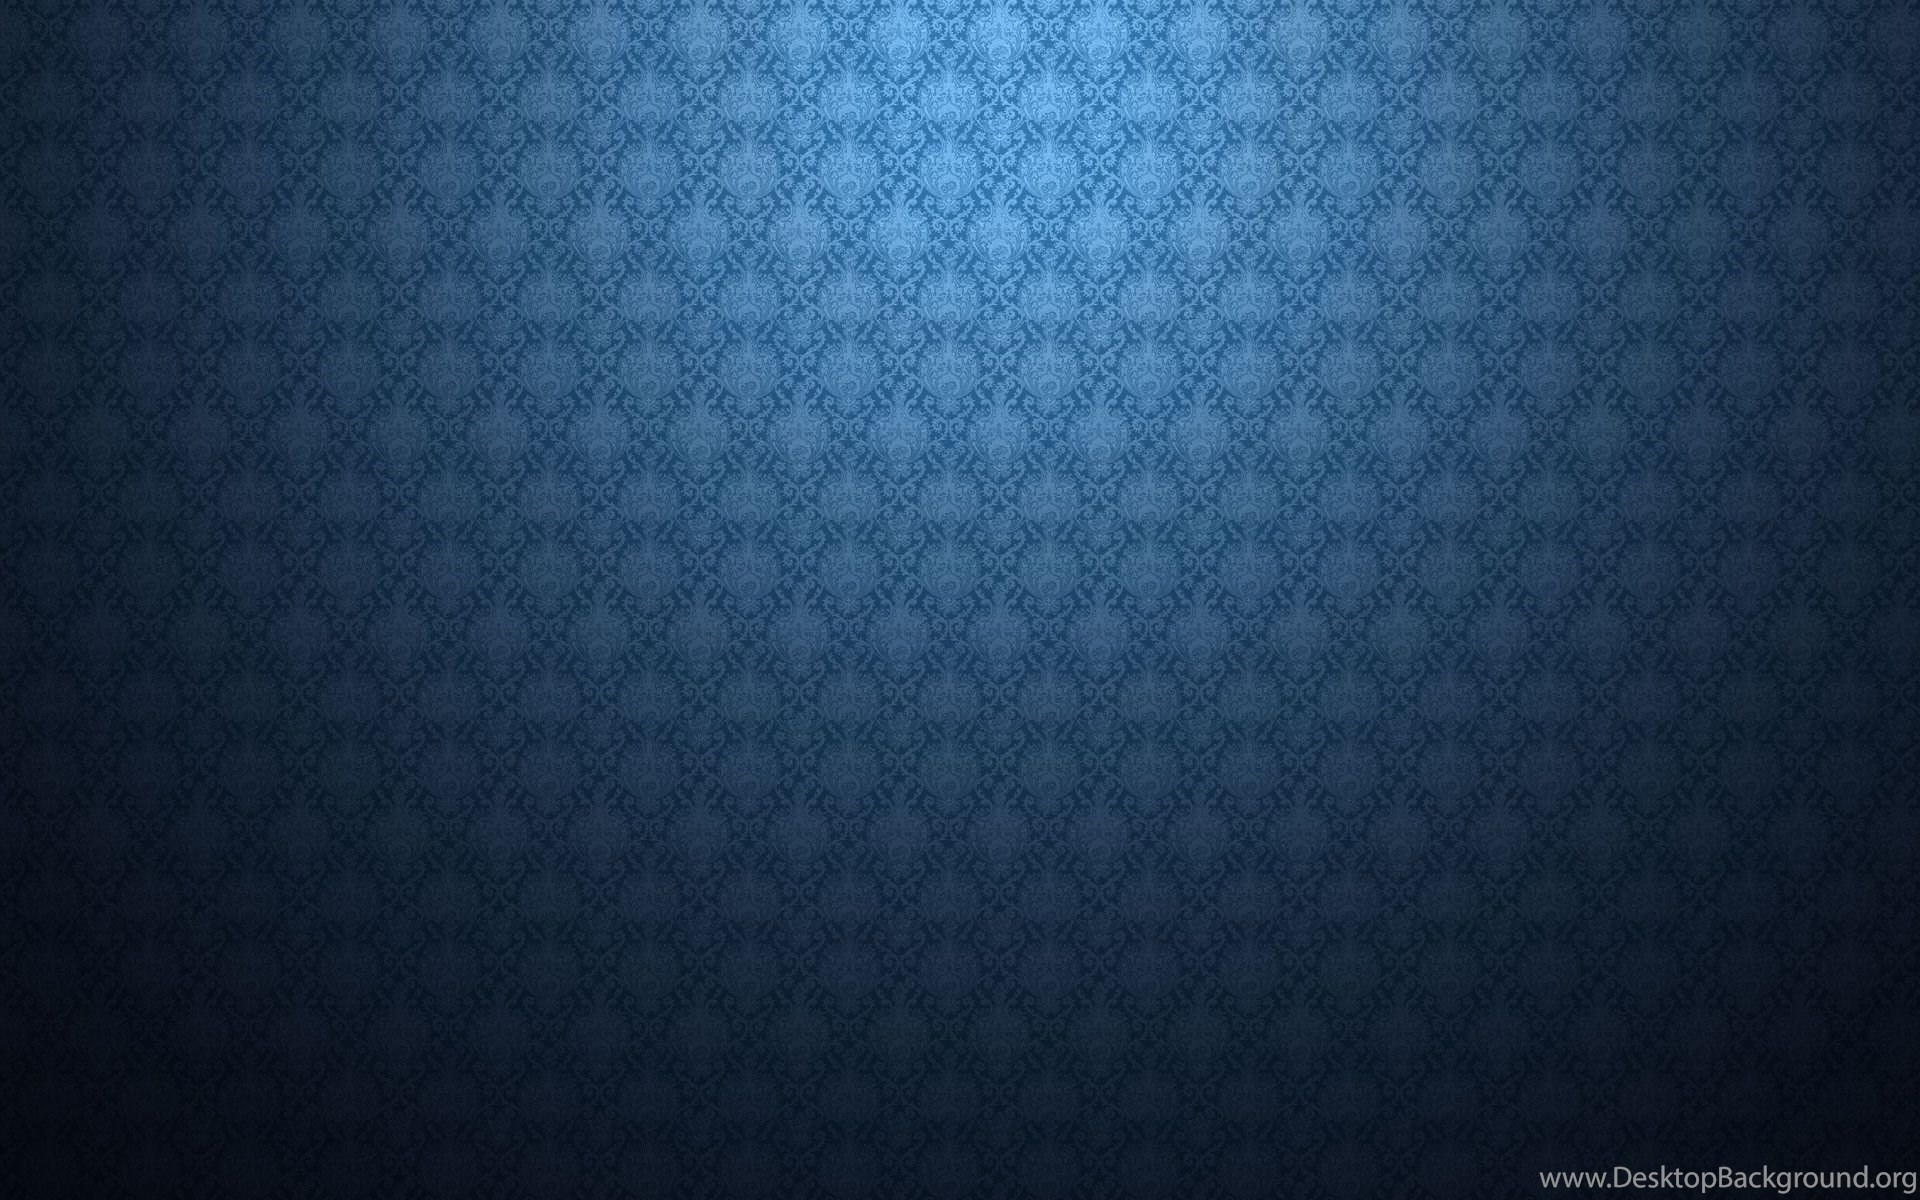 pattern computer wallpapers, desktop backgrounds desktop background